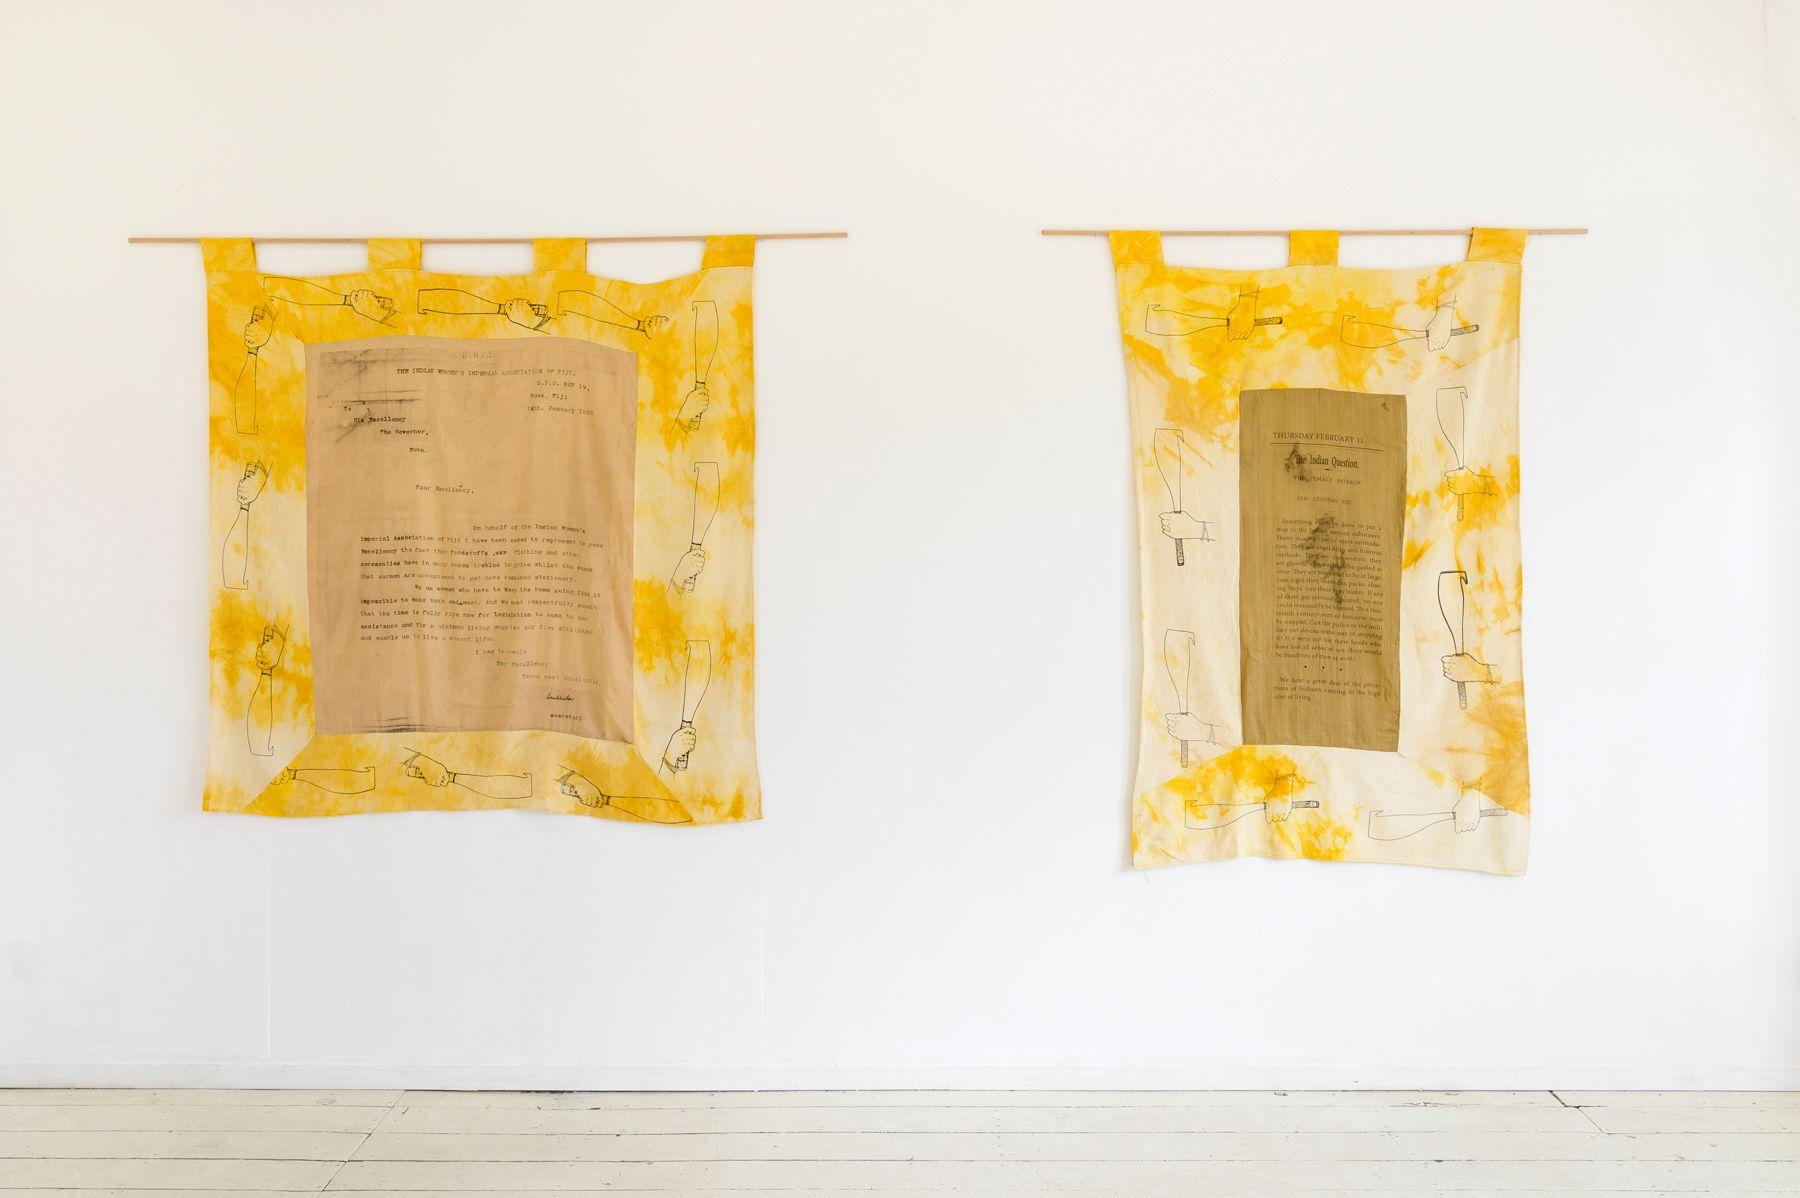 Quishile Charan, Sushila's Letter, 2019, archival document, cotton, textile ink, natural dye: haldi (turmeric) and kumkum seeds, 136 x 130 cm.